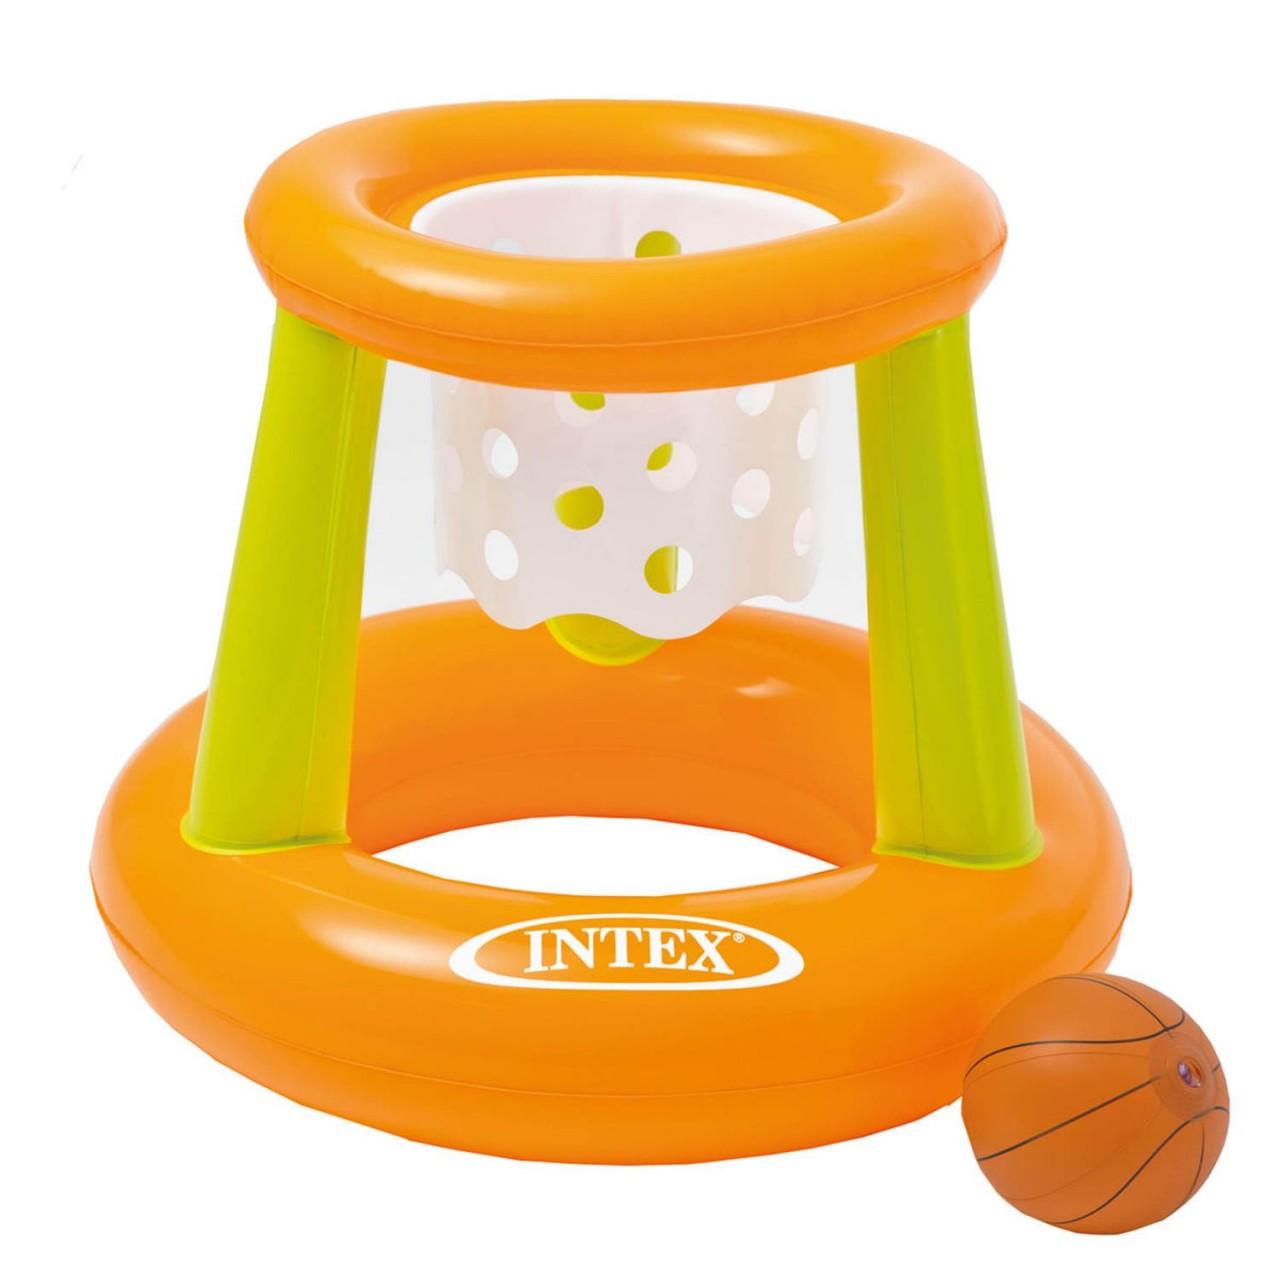 Intex 58504 Wasserspiel Floating Hoops Mehrfarbig 67 x 55 cm